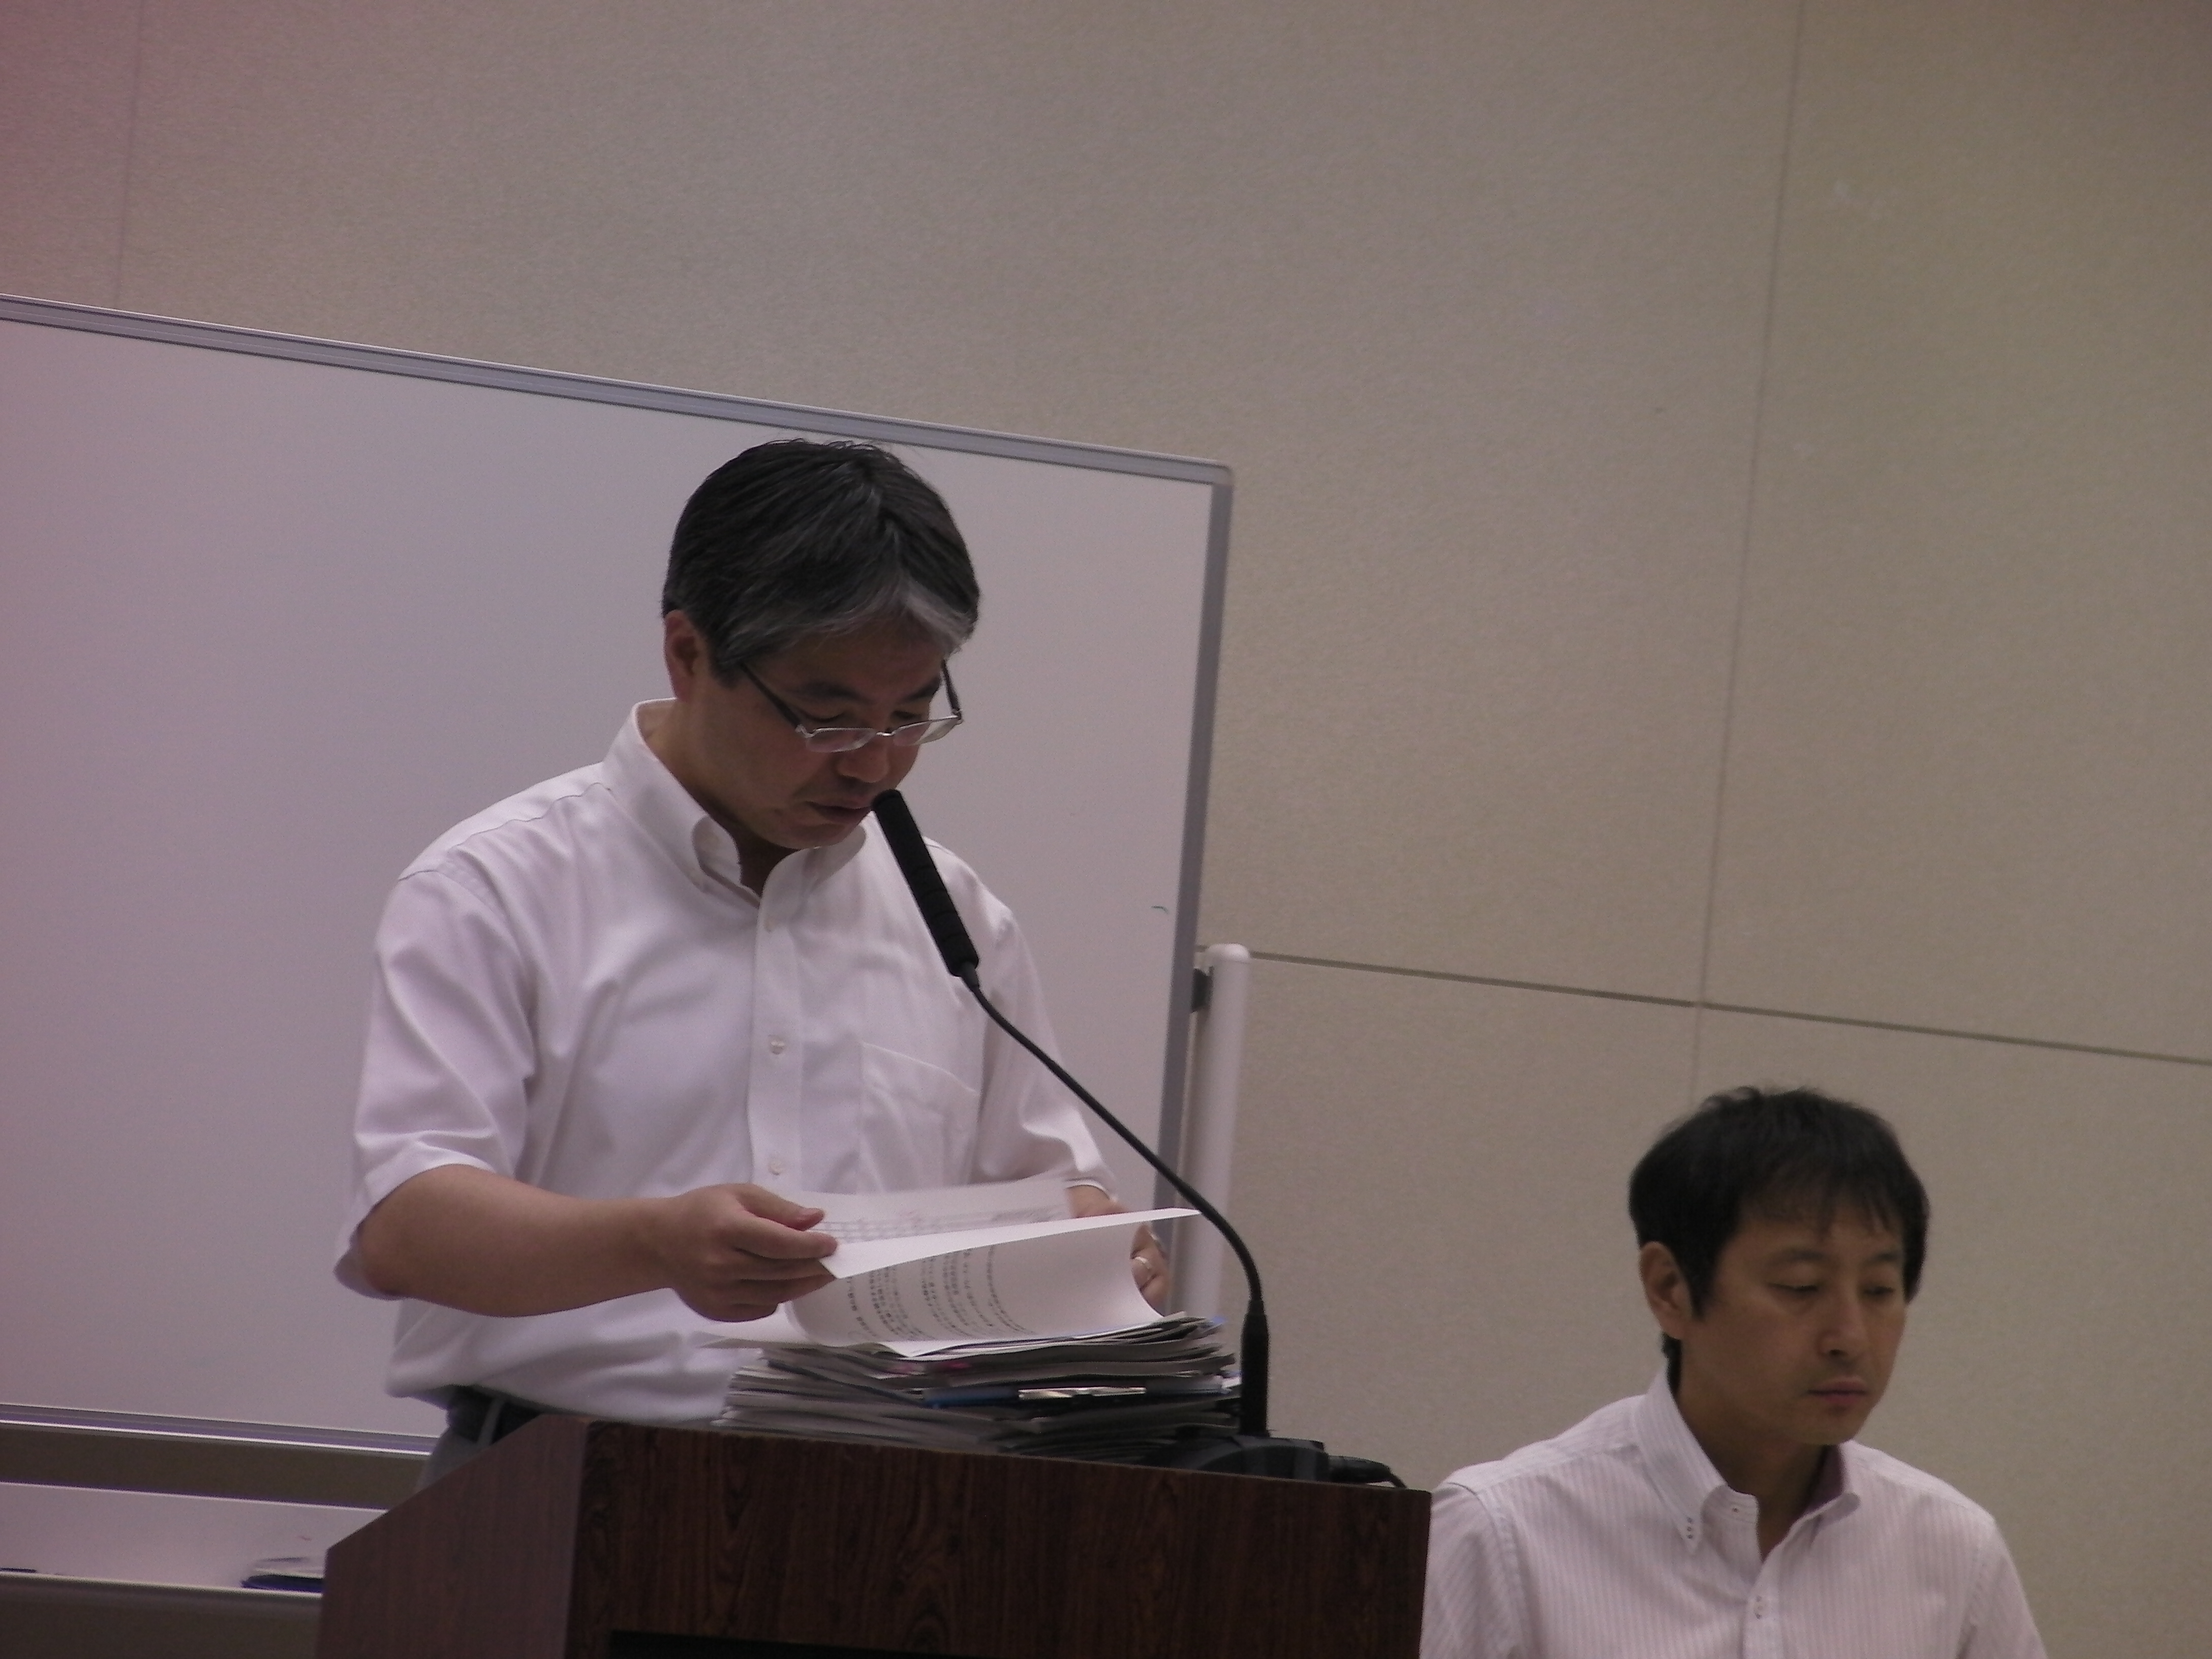 http://daily.magazine9.jp/m9/oshidori/SANY0102.JPG